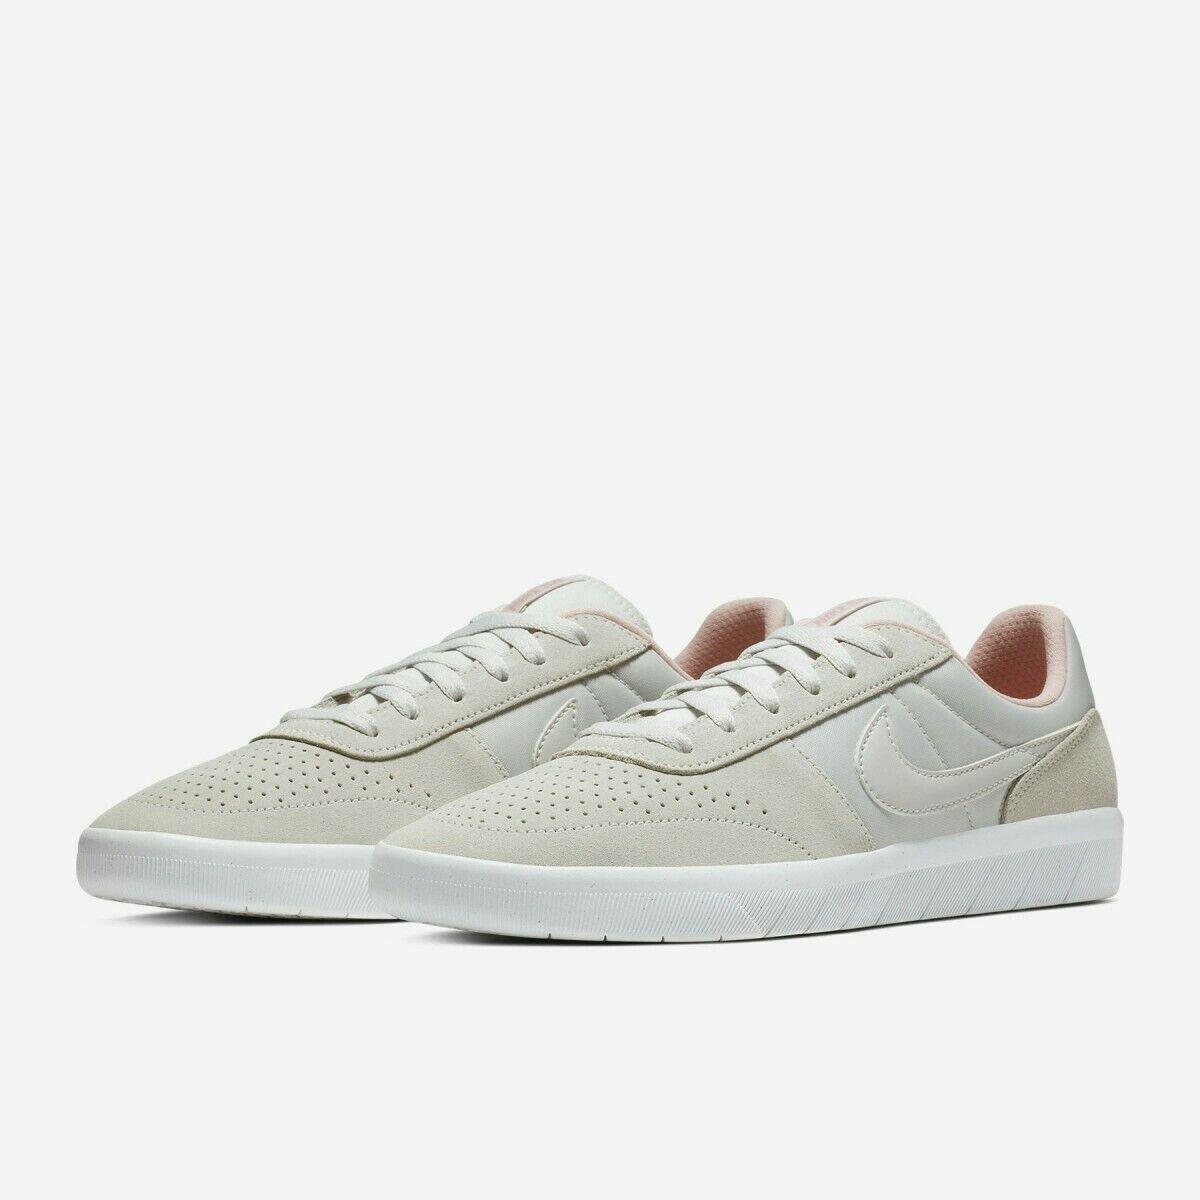 Nike SB Team Classic Grey Pink UK Size 12 AH3360 005